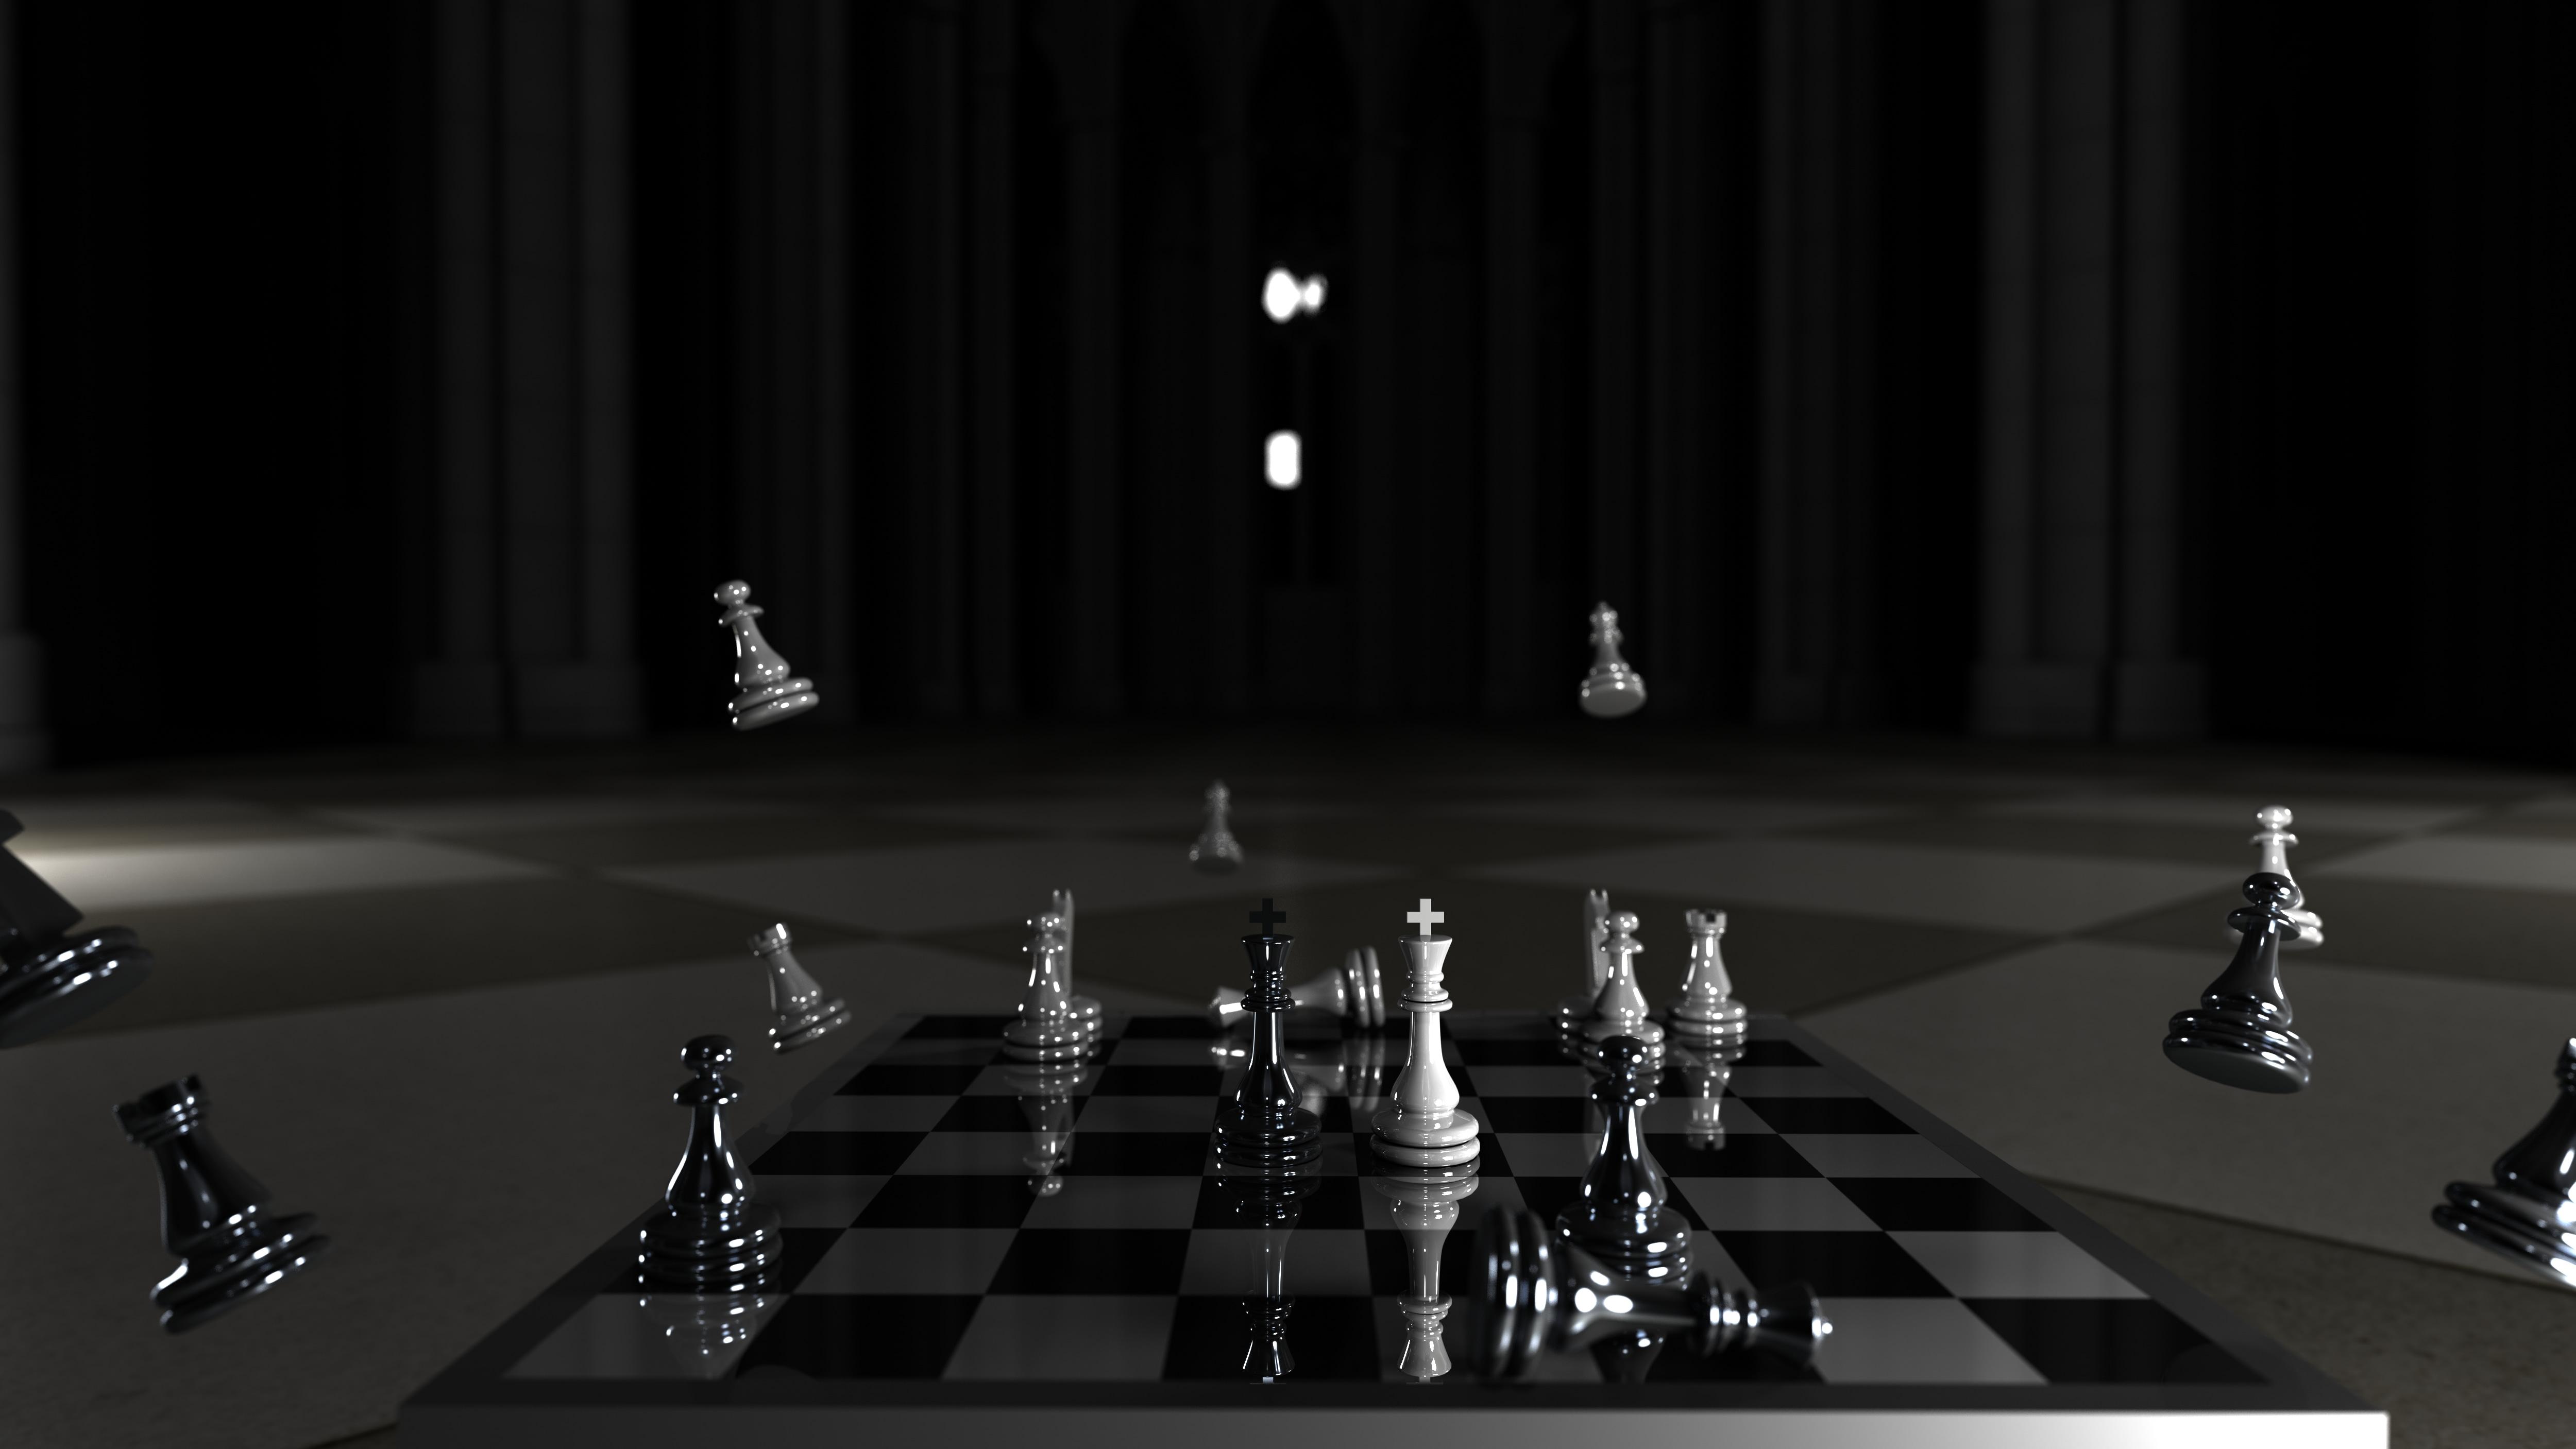 Chess Wallpaper black and white 4K